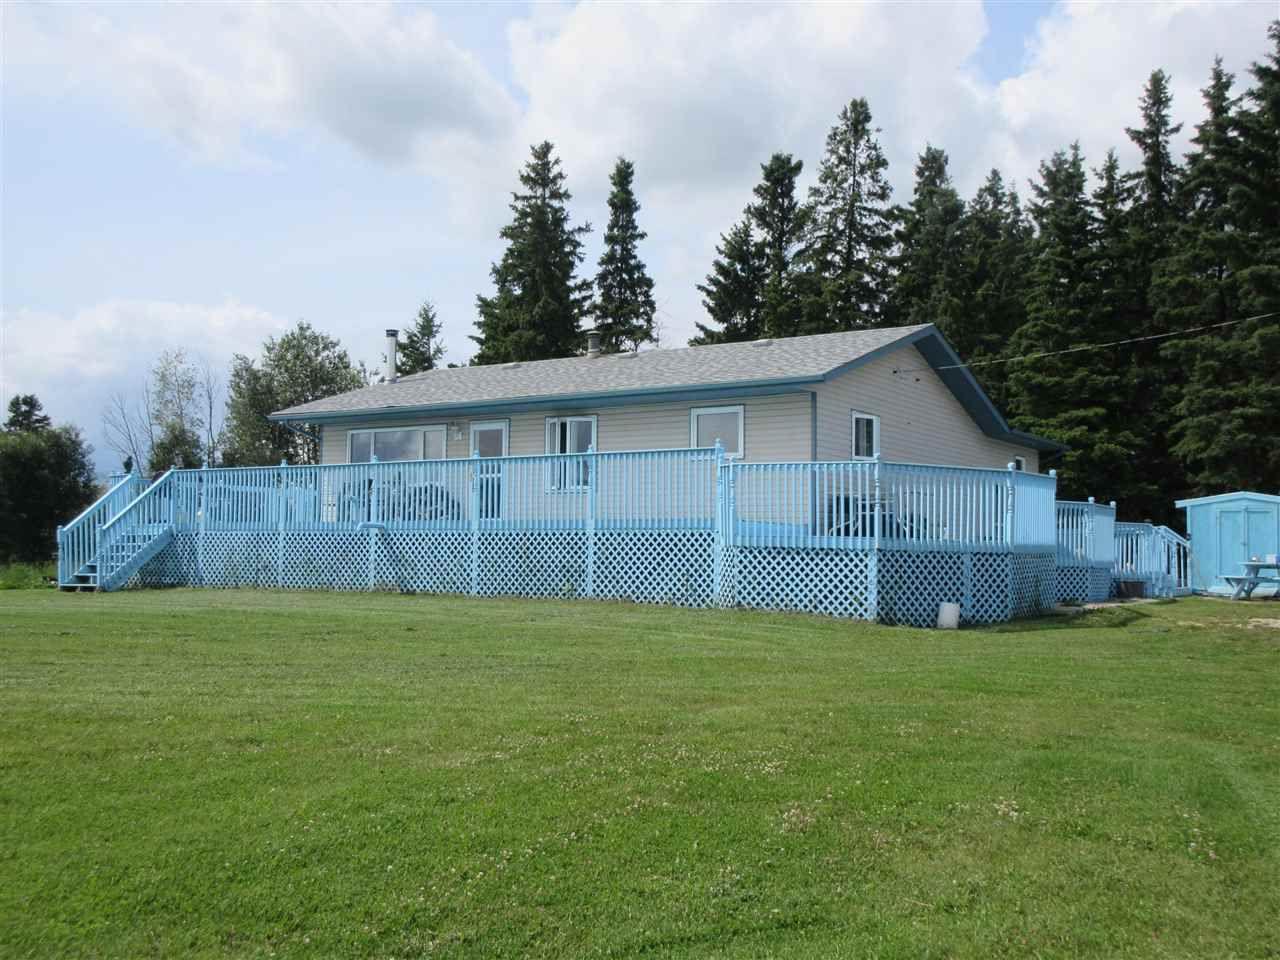 Main Photo: 60227 RR 214: Rural Thorhild County House for sale : MLS®# E4164685